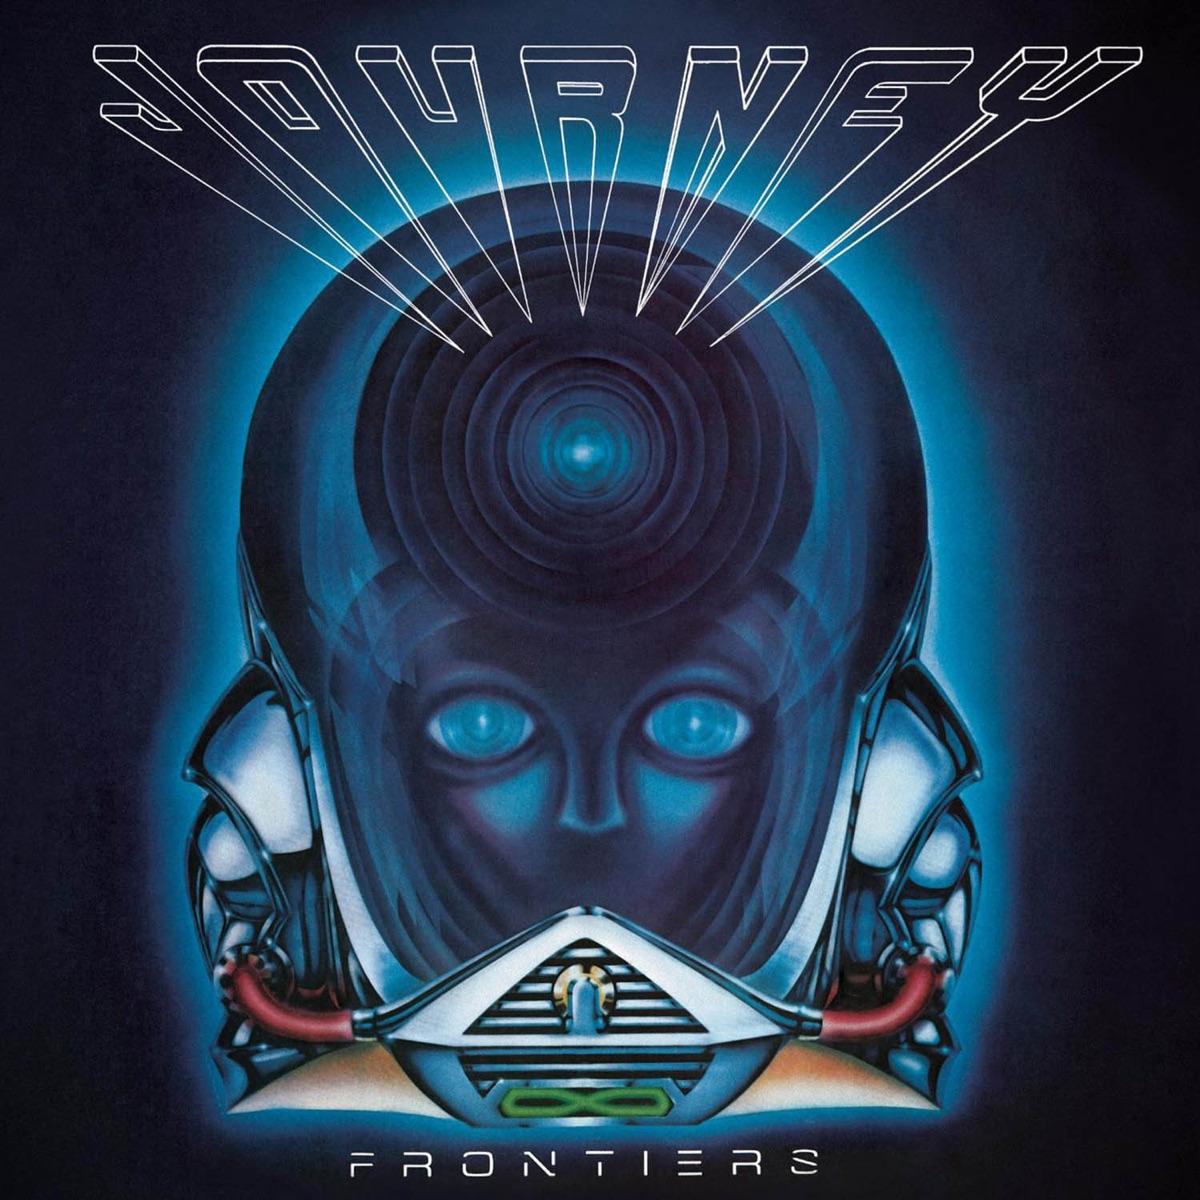 Frontiers Remastered Bonus Tracks Version Journey CD cover